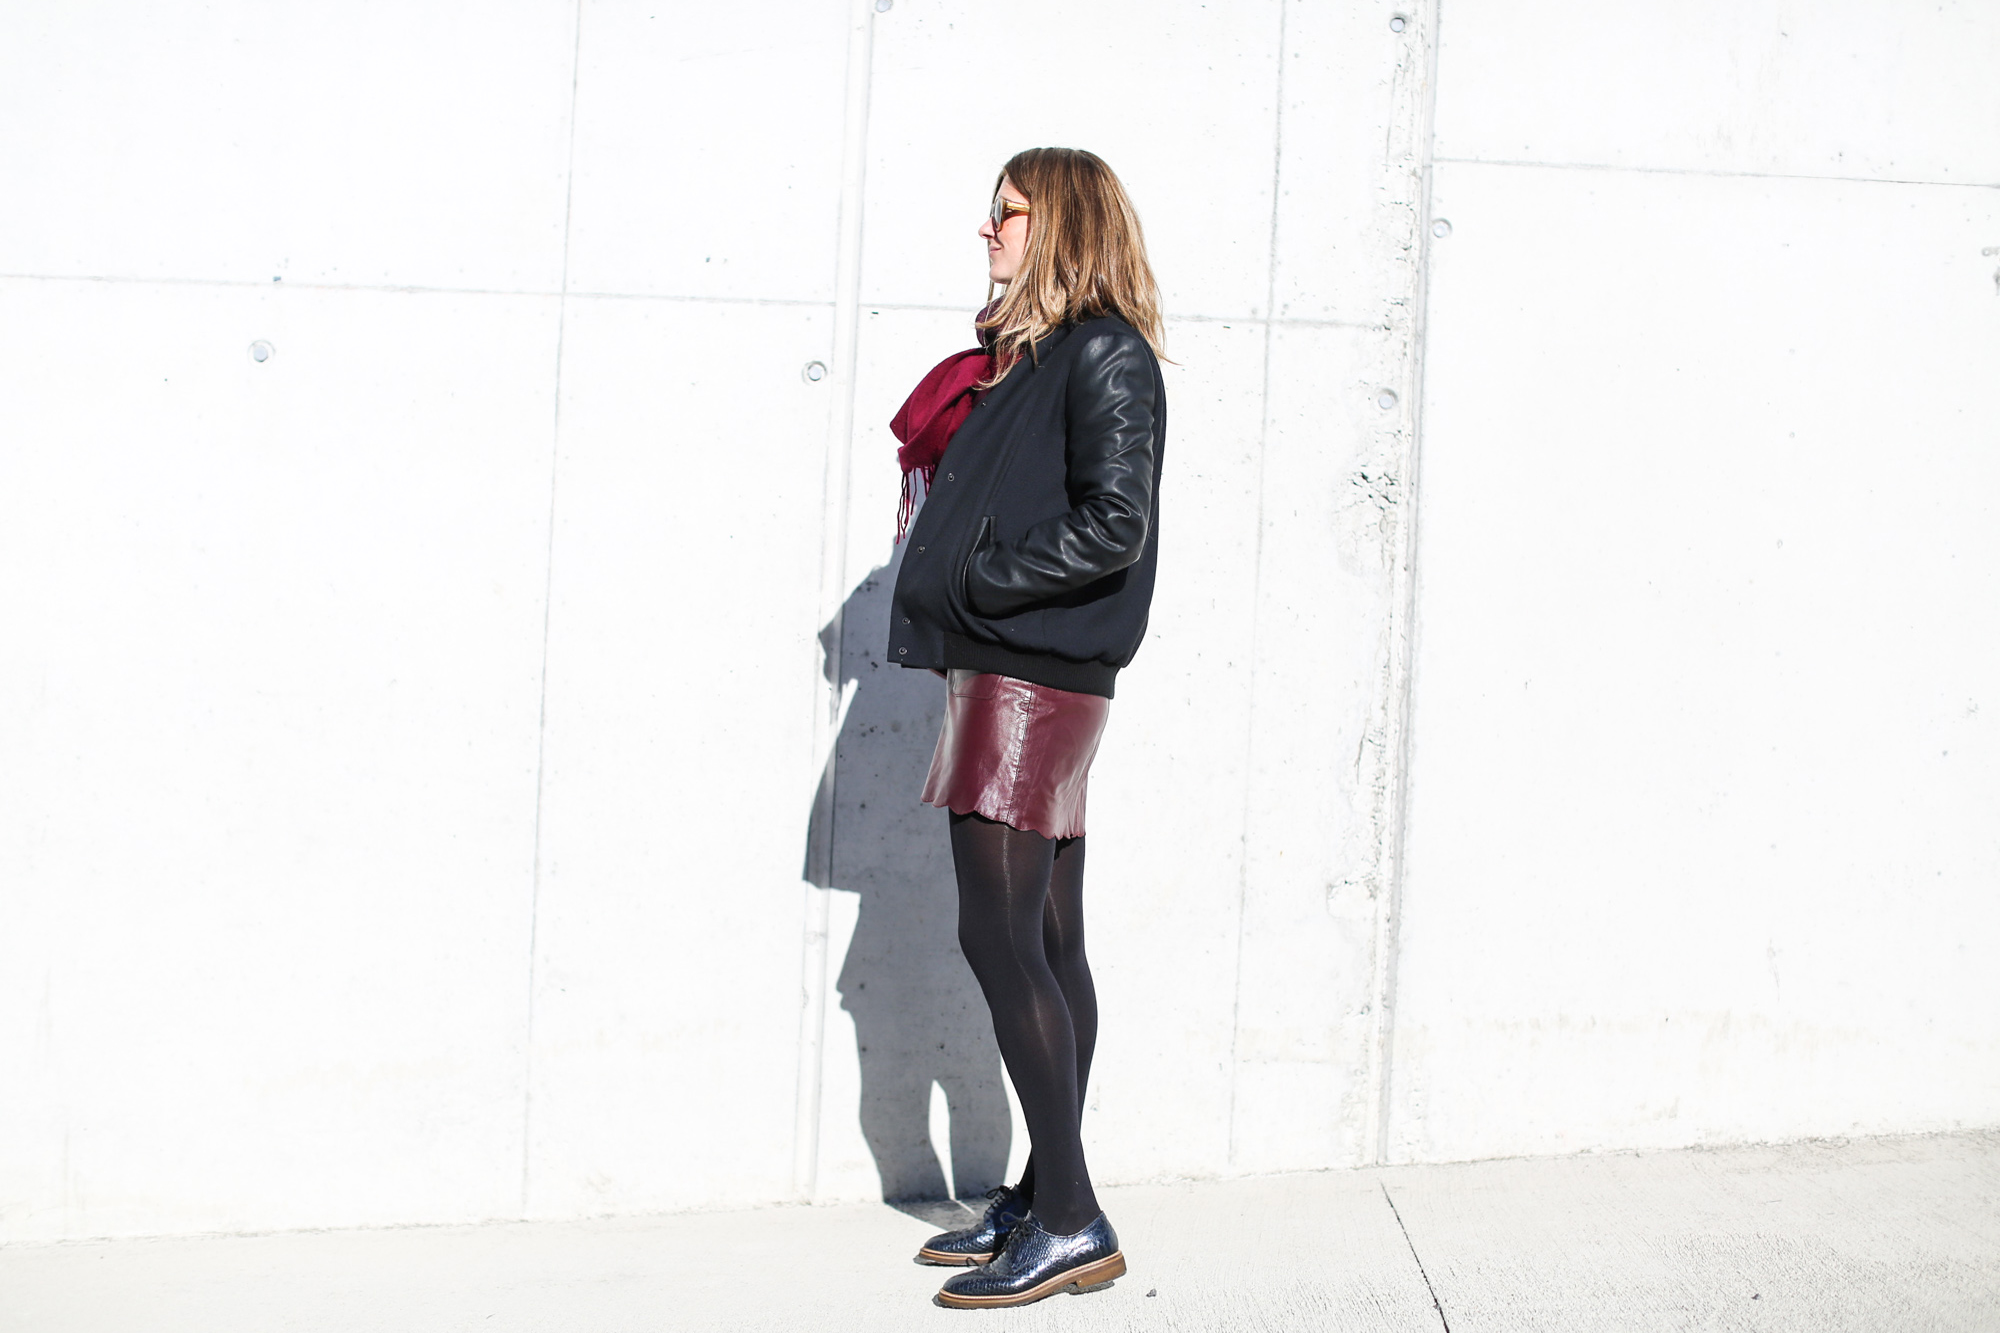 Clochet_fashionblogger_streetstyle_andotherstories_metallicflowersknit_heroscarf_leatherminiskirt-6